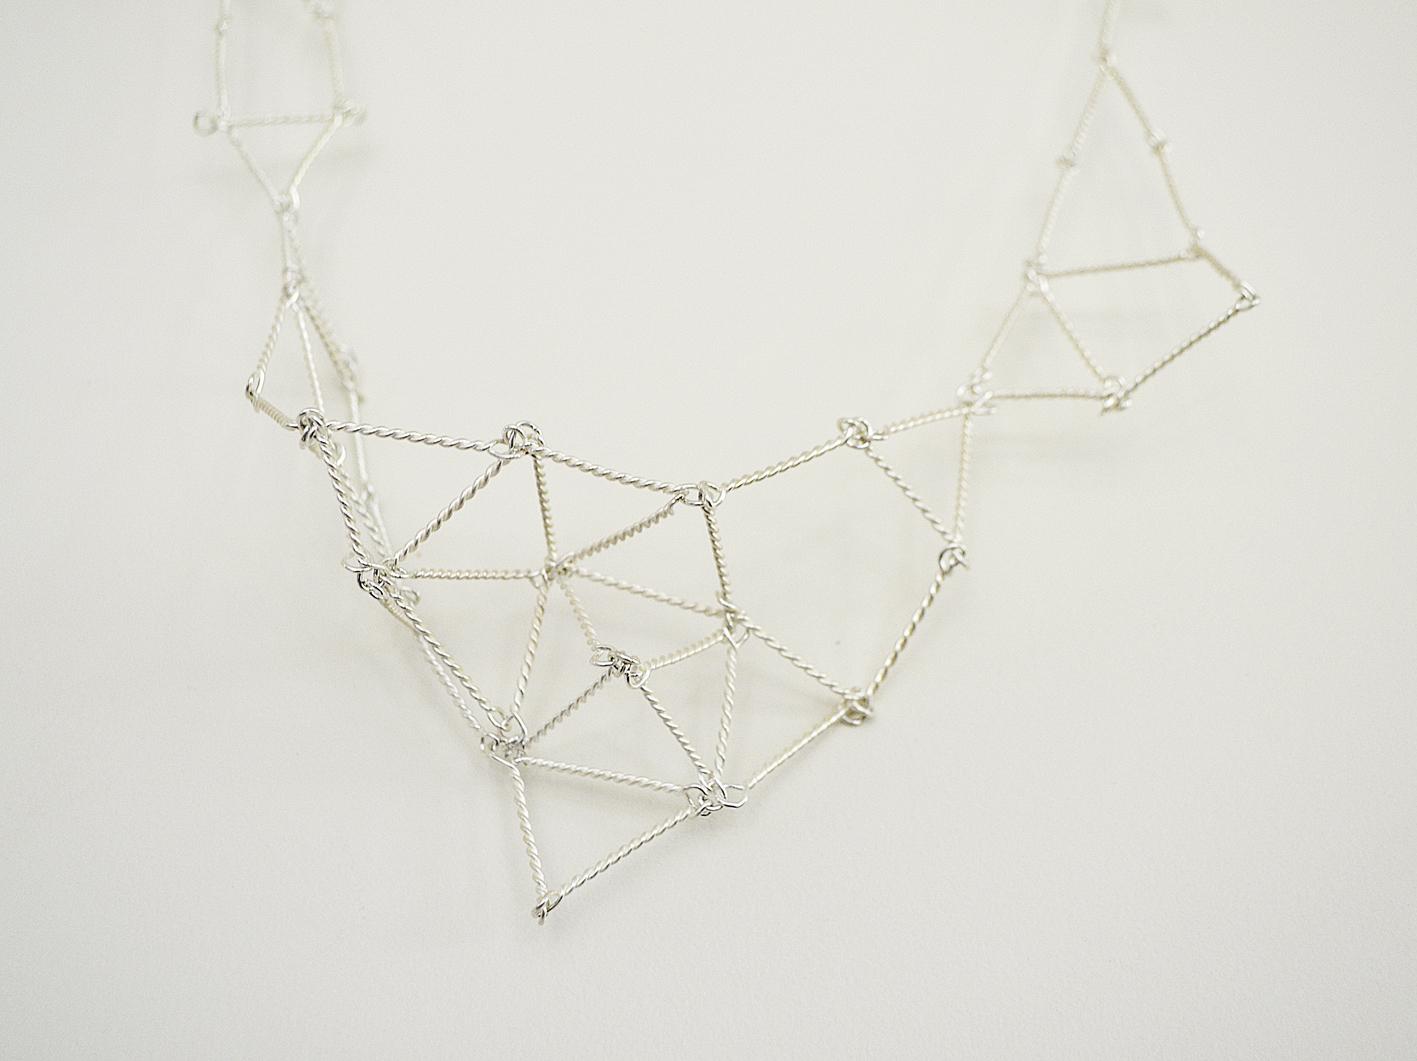 Cosmic Net necklace detail